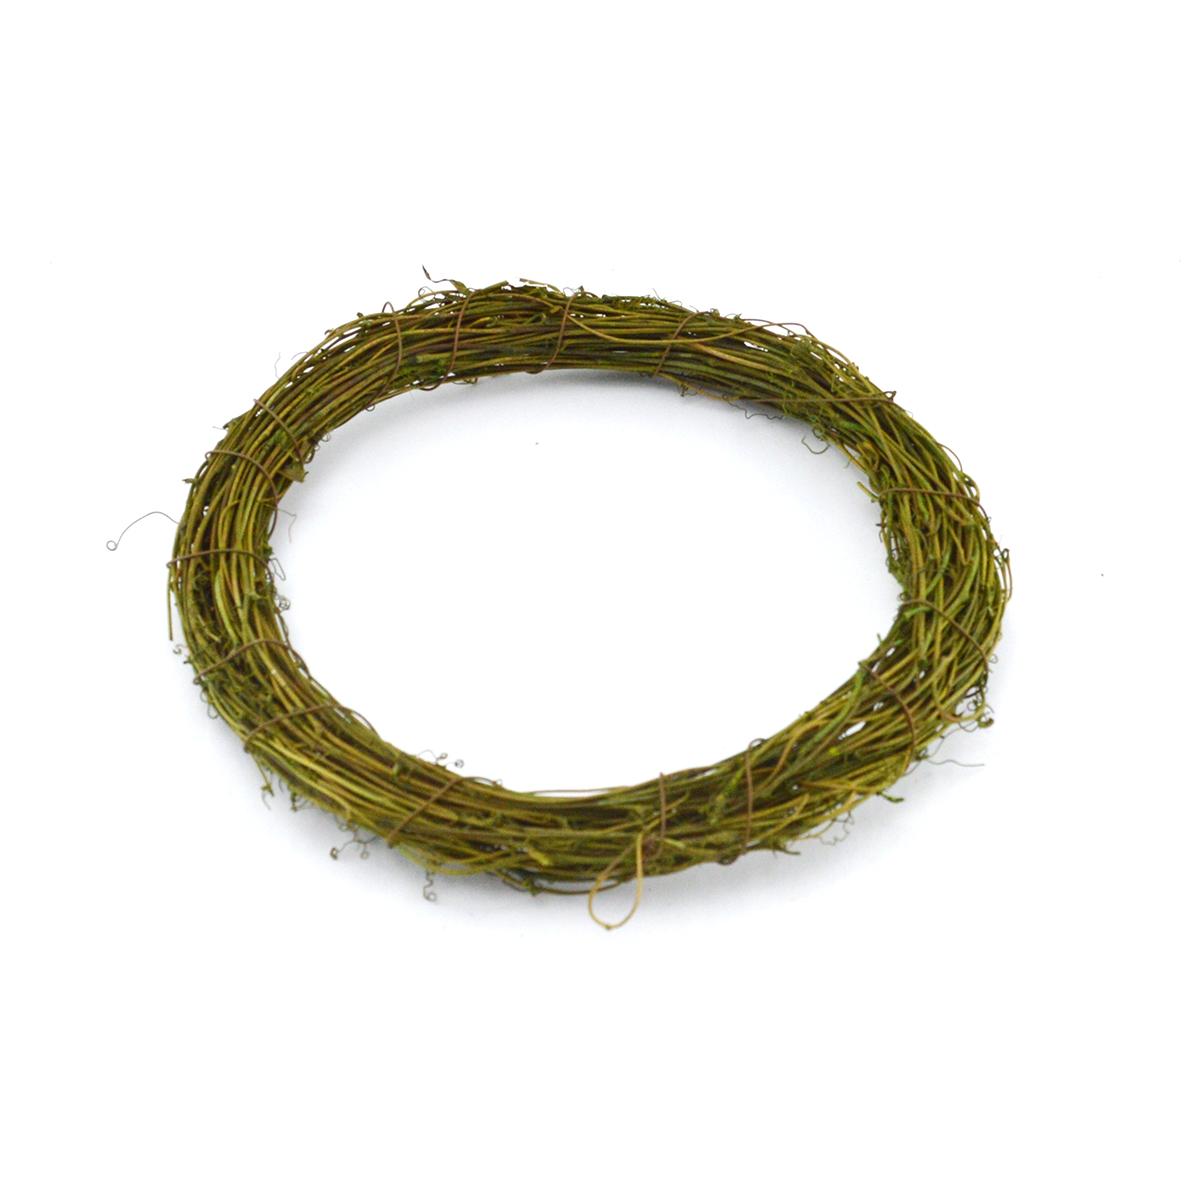 Ambalaje Flori ONLINE vinde Coronita naturala verde 25cm la pretul de 9.9 lei